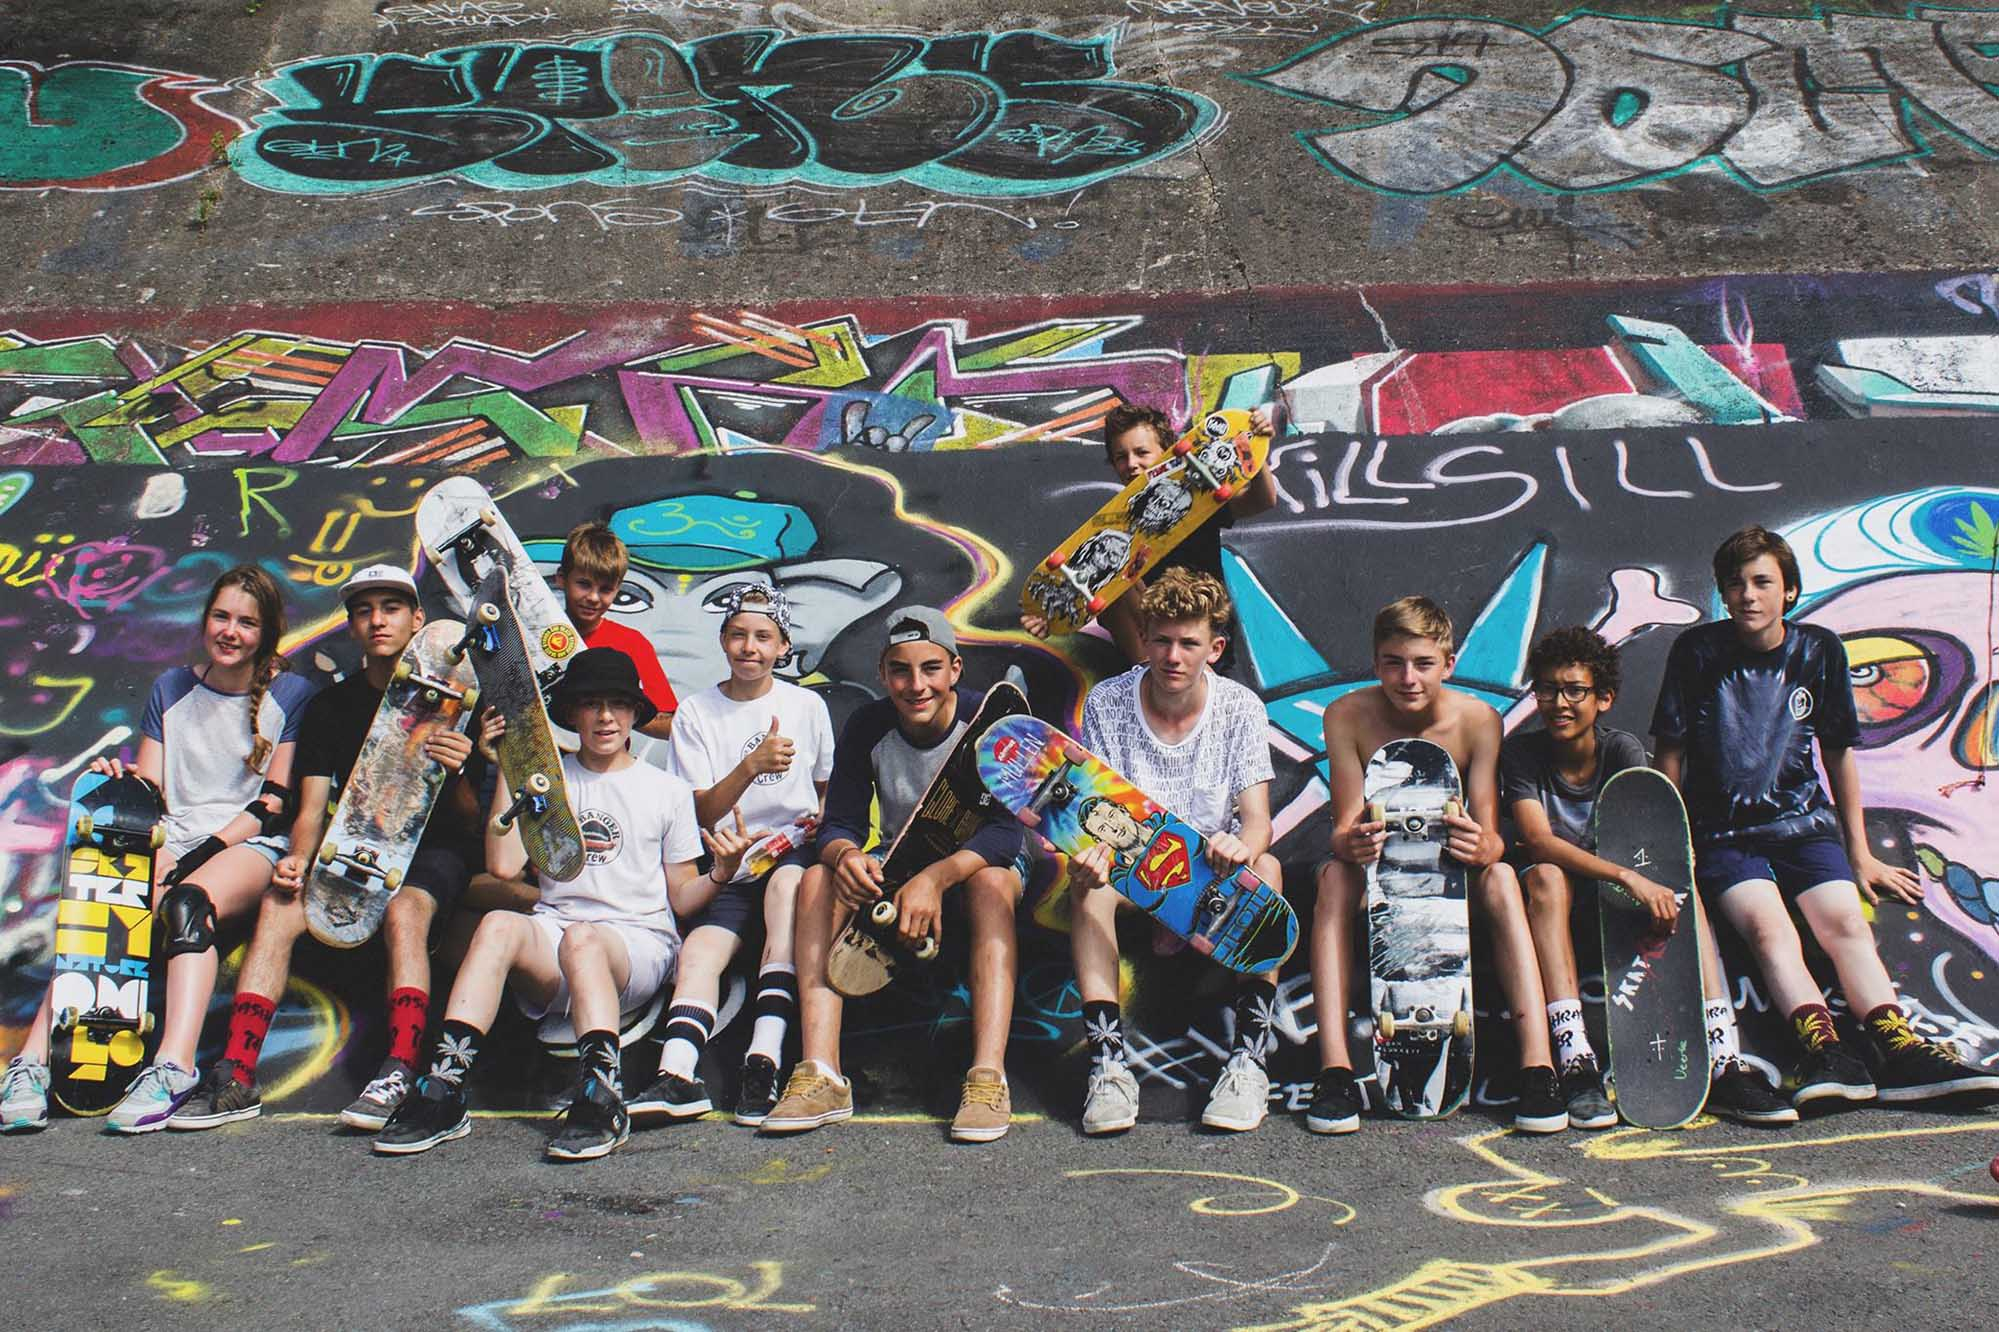 Skate Camp Skatoria 2015